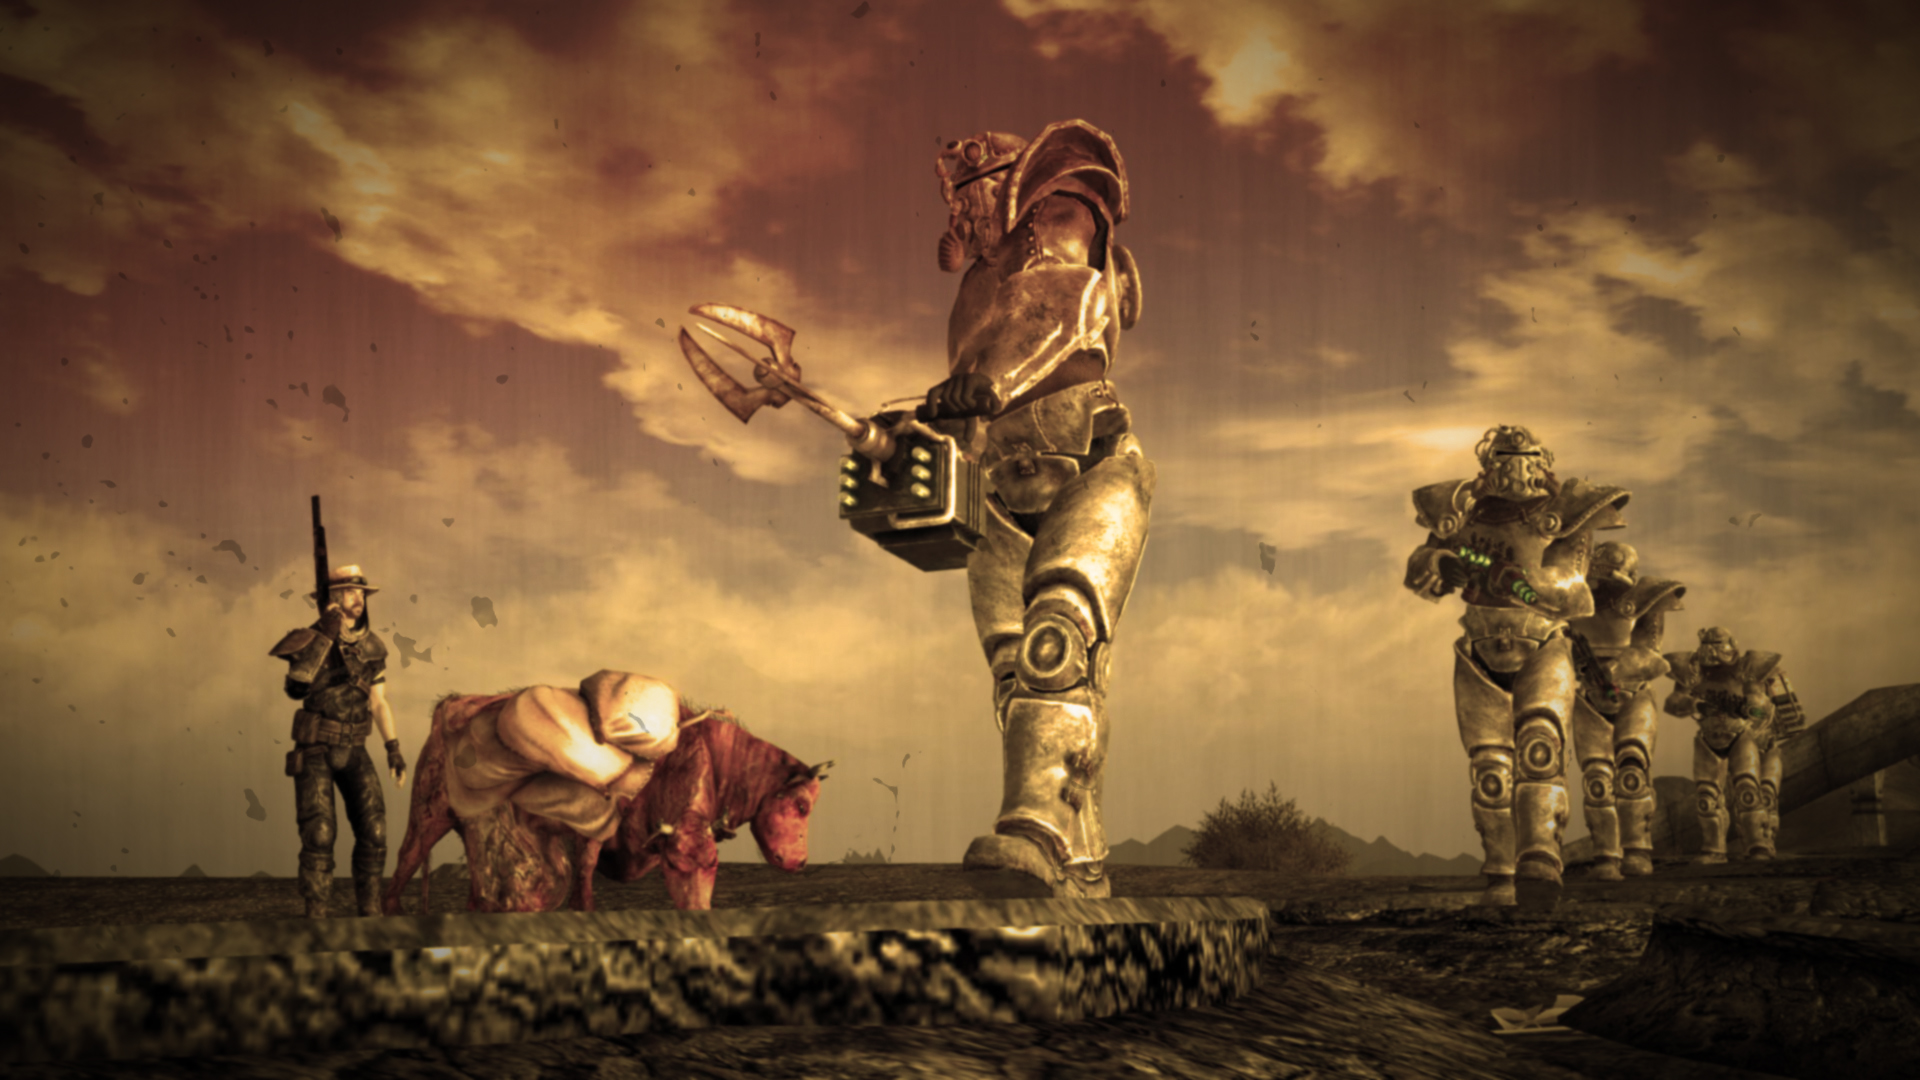 Fallout 3 Wallpaper Brotherhood Of Steel Fallout 3 brotherhood of 1920x1080